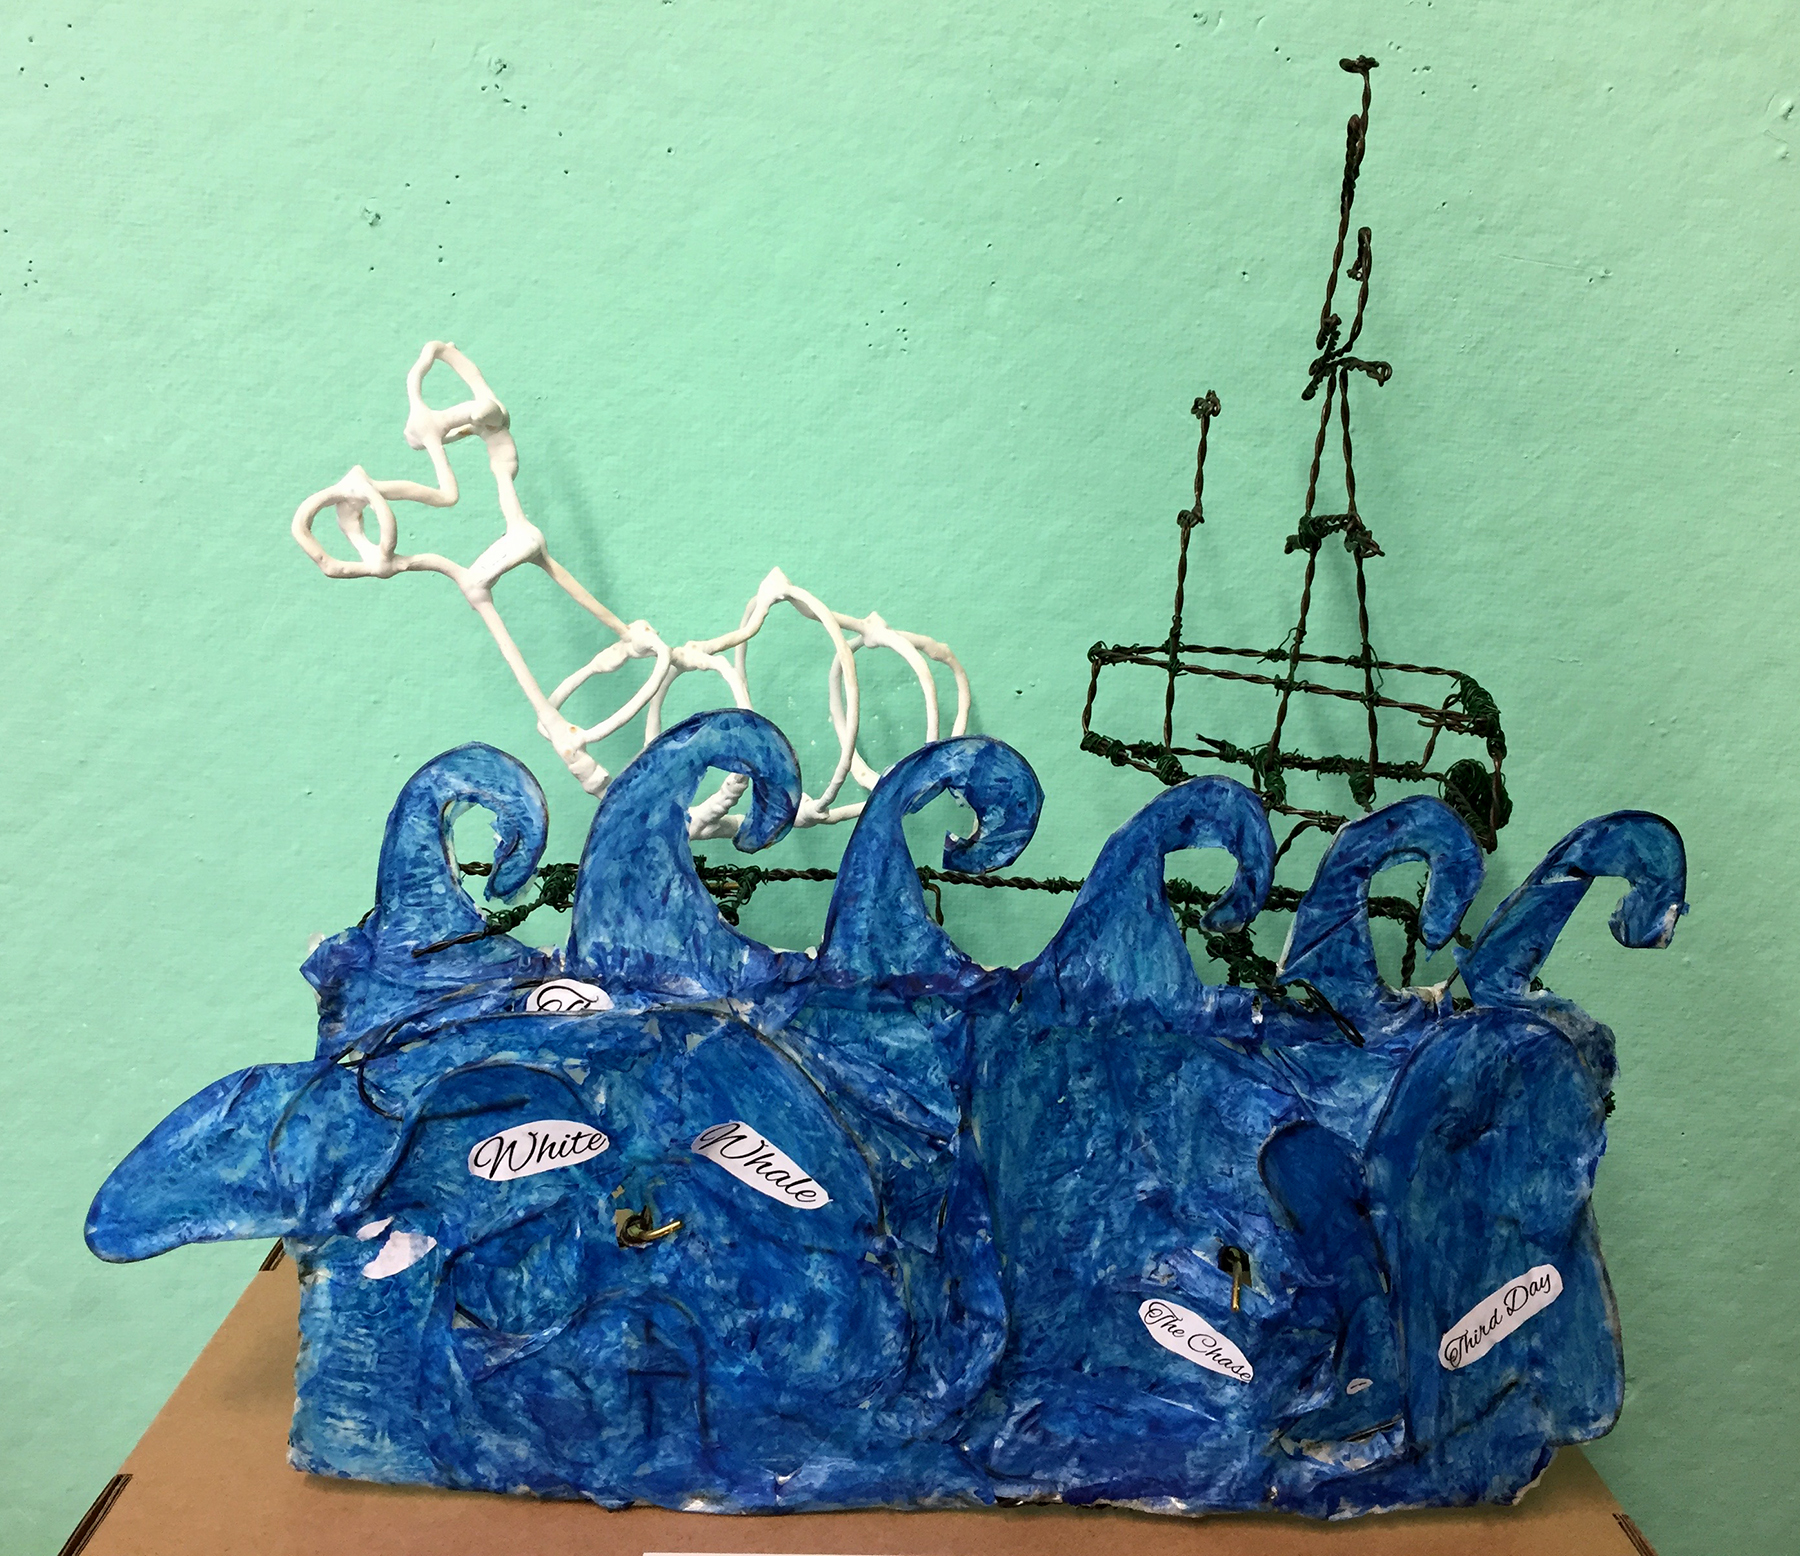 Julia K-Moby Dick.jpg